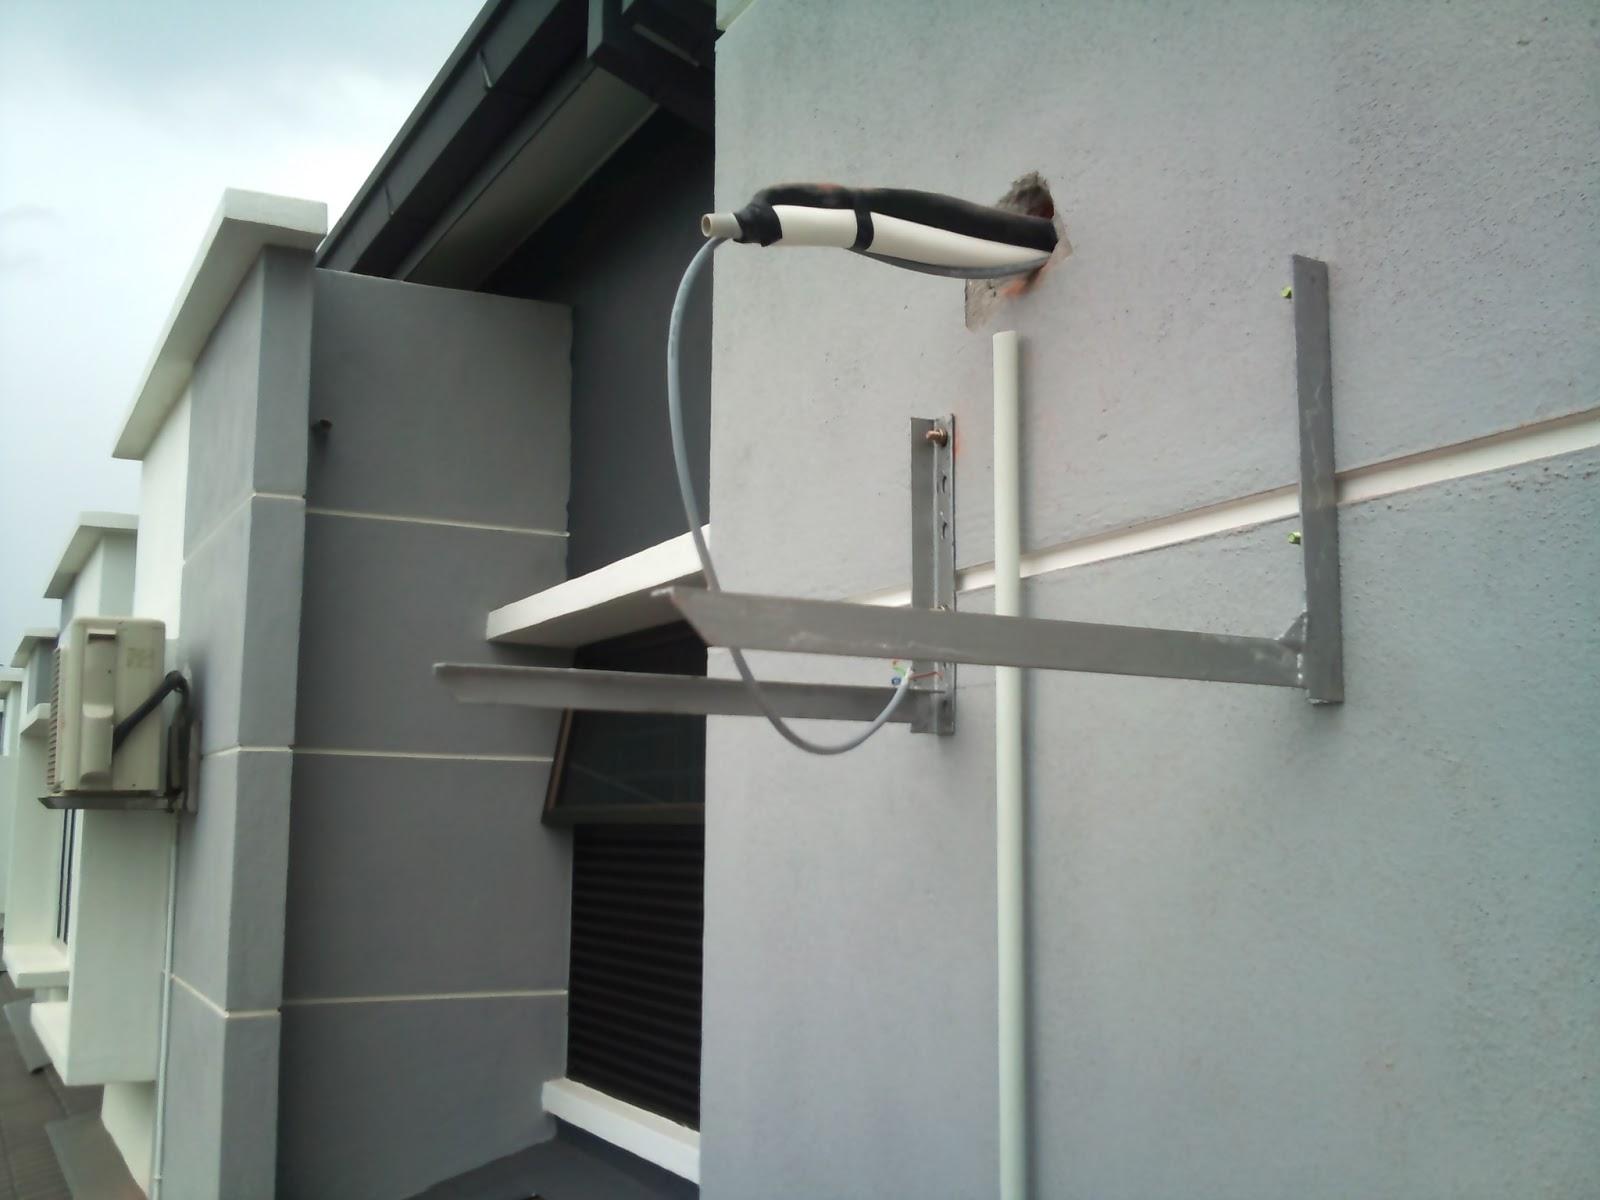 Wiring  U0026 Aircon Service  Sungai Petani   Pasang Air Cond